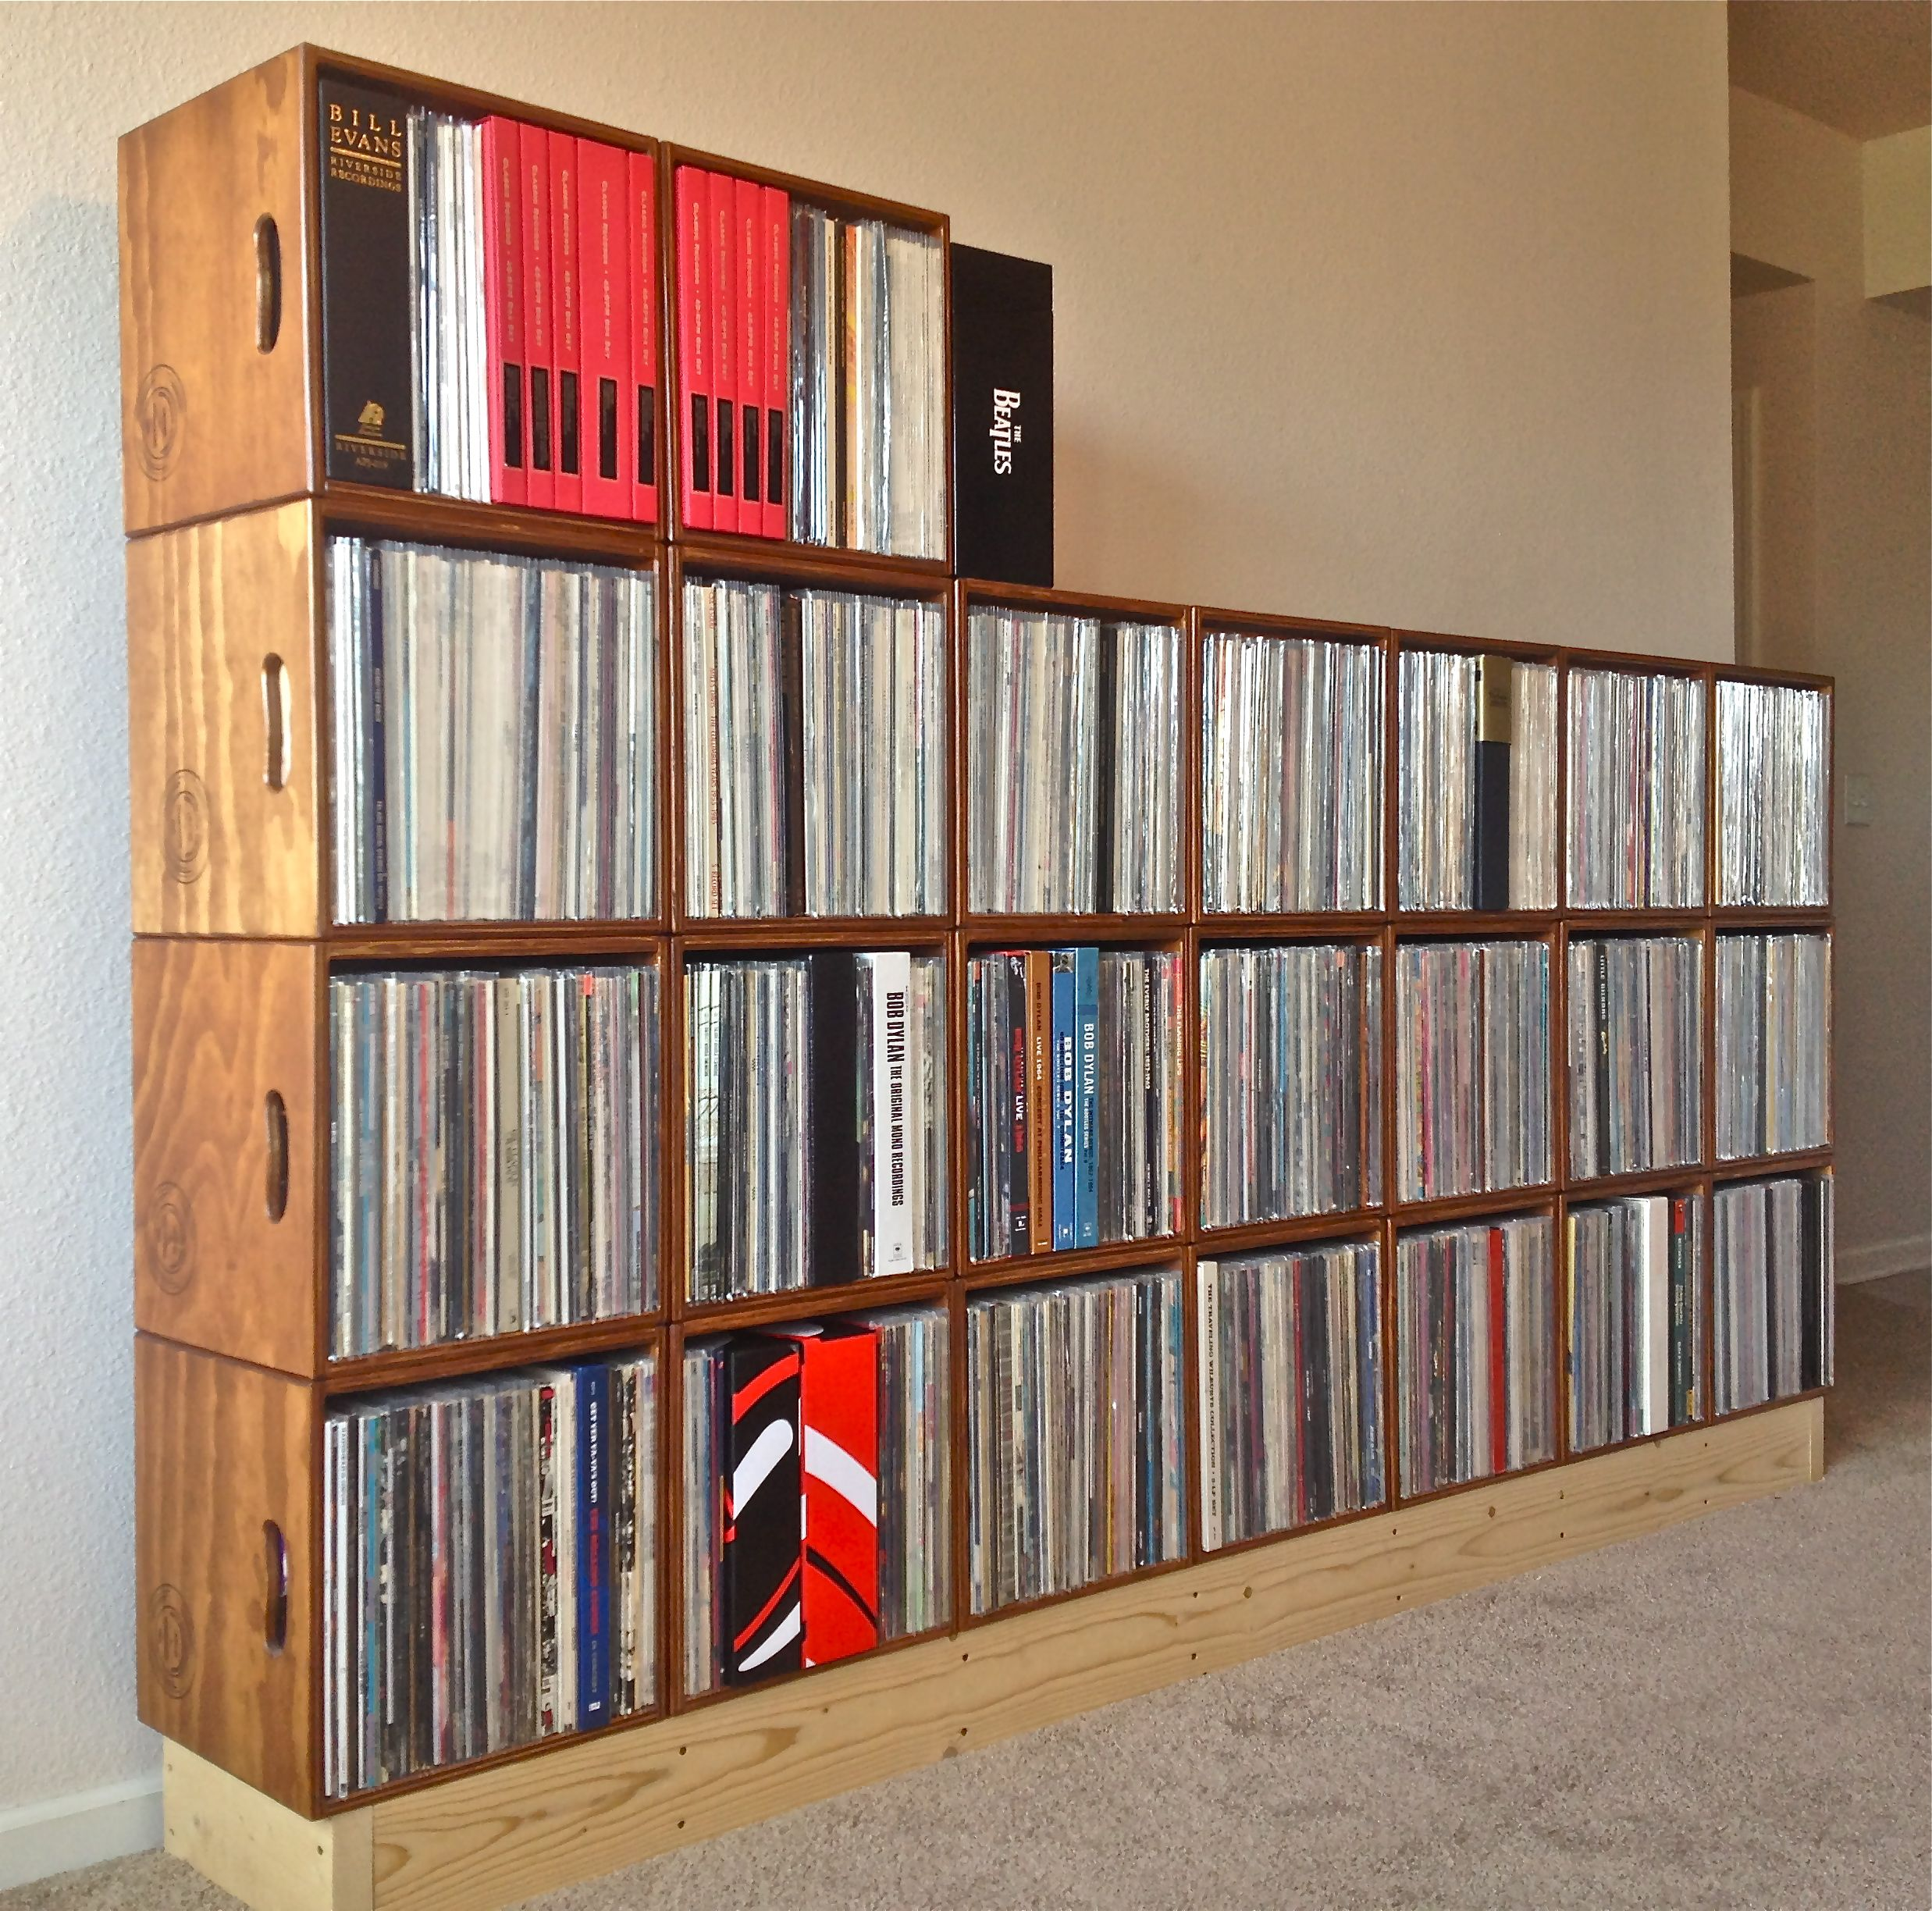 Colorado record crates i love the simplicity of it